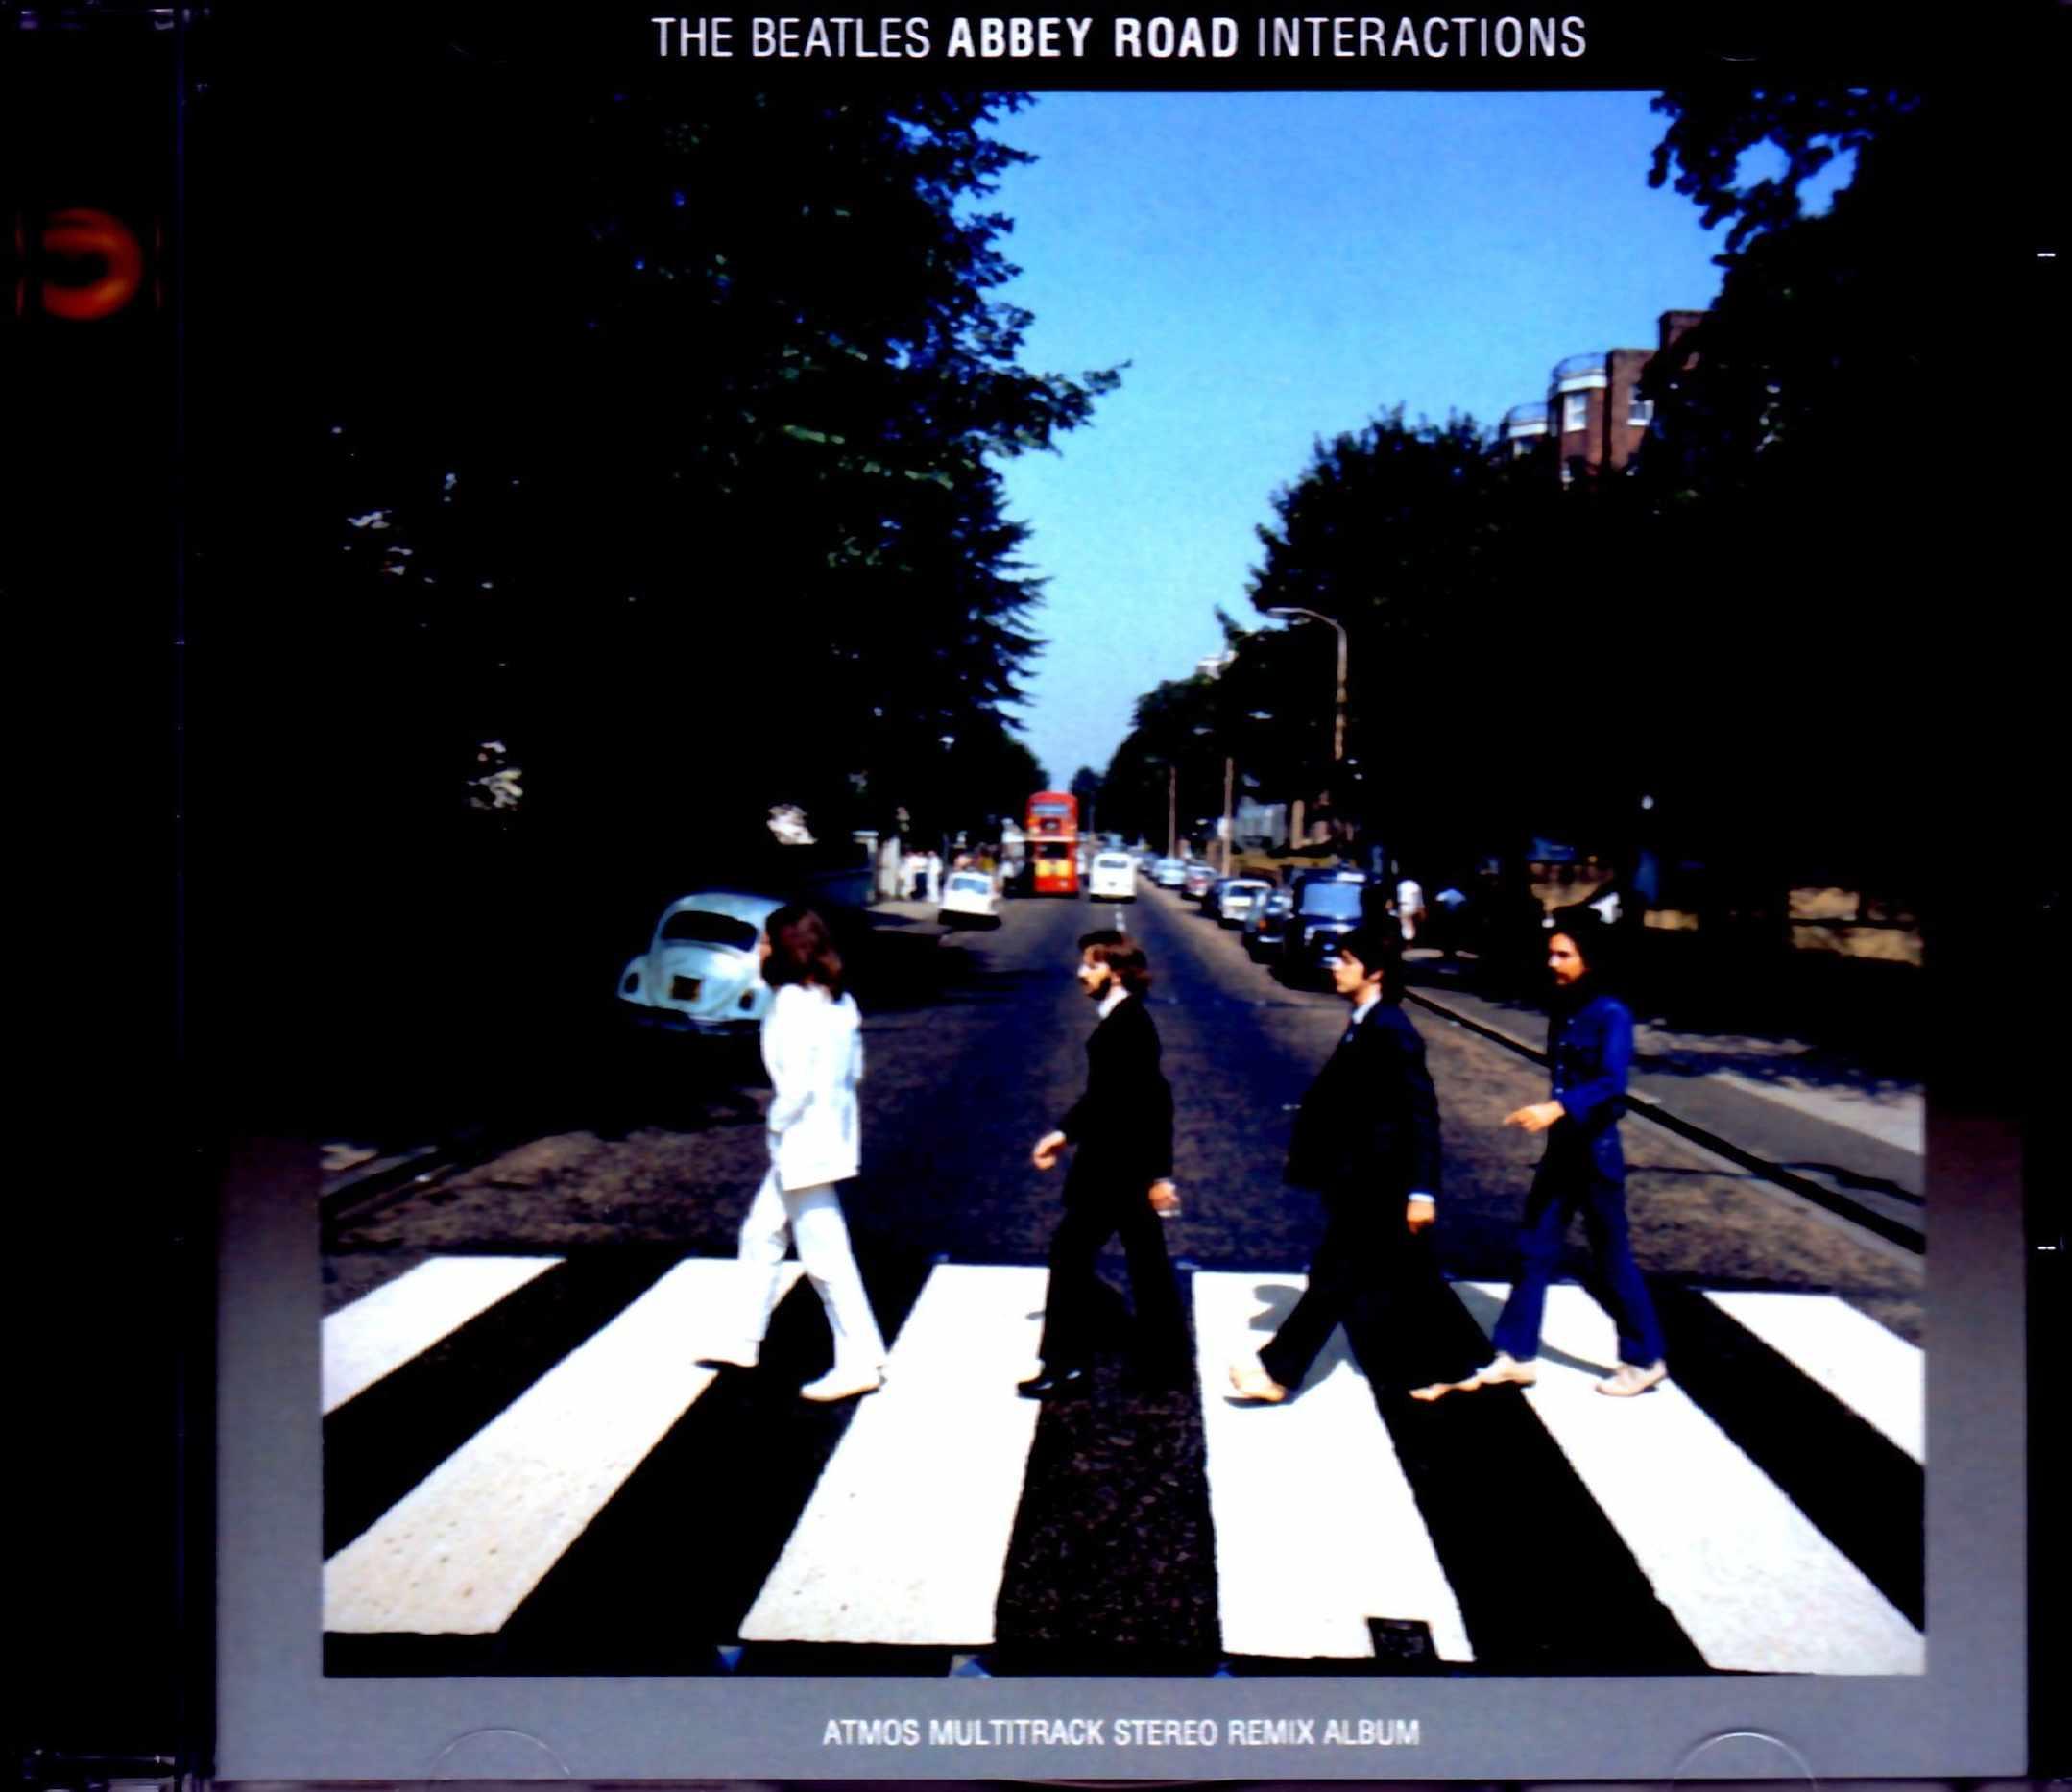 Beatles ビートルズ/アビィ・ロード Abbey Road Atoms Multitrack Stereo Remix Album